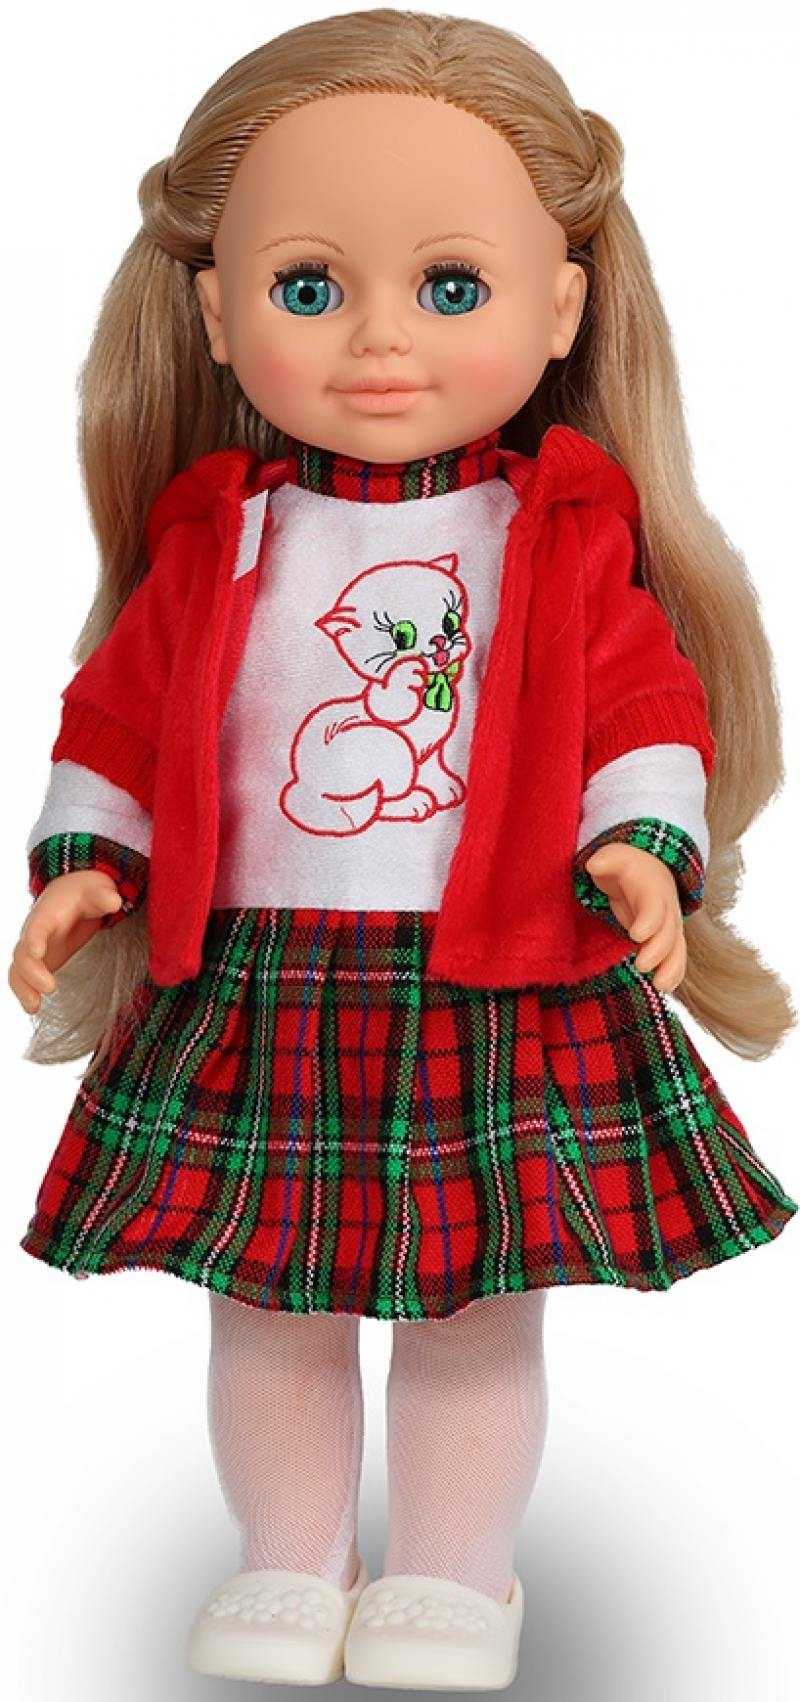 Кукла ВЕСНА Анна 14 (озвученная) В2874/о кукла весна лиза 1 озвученная в35 о